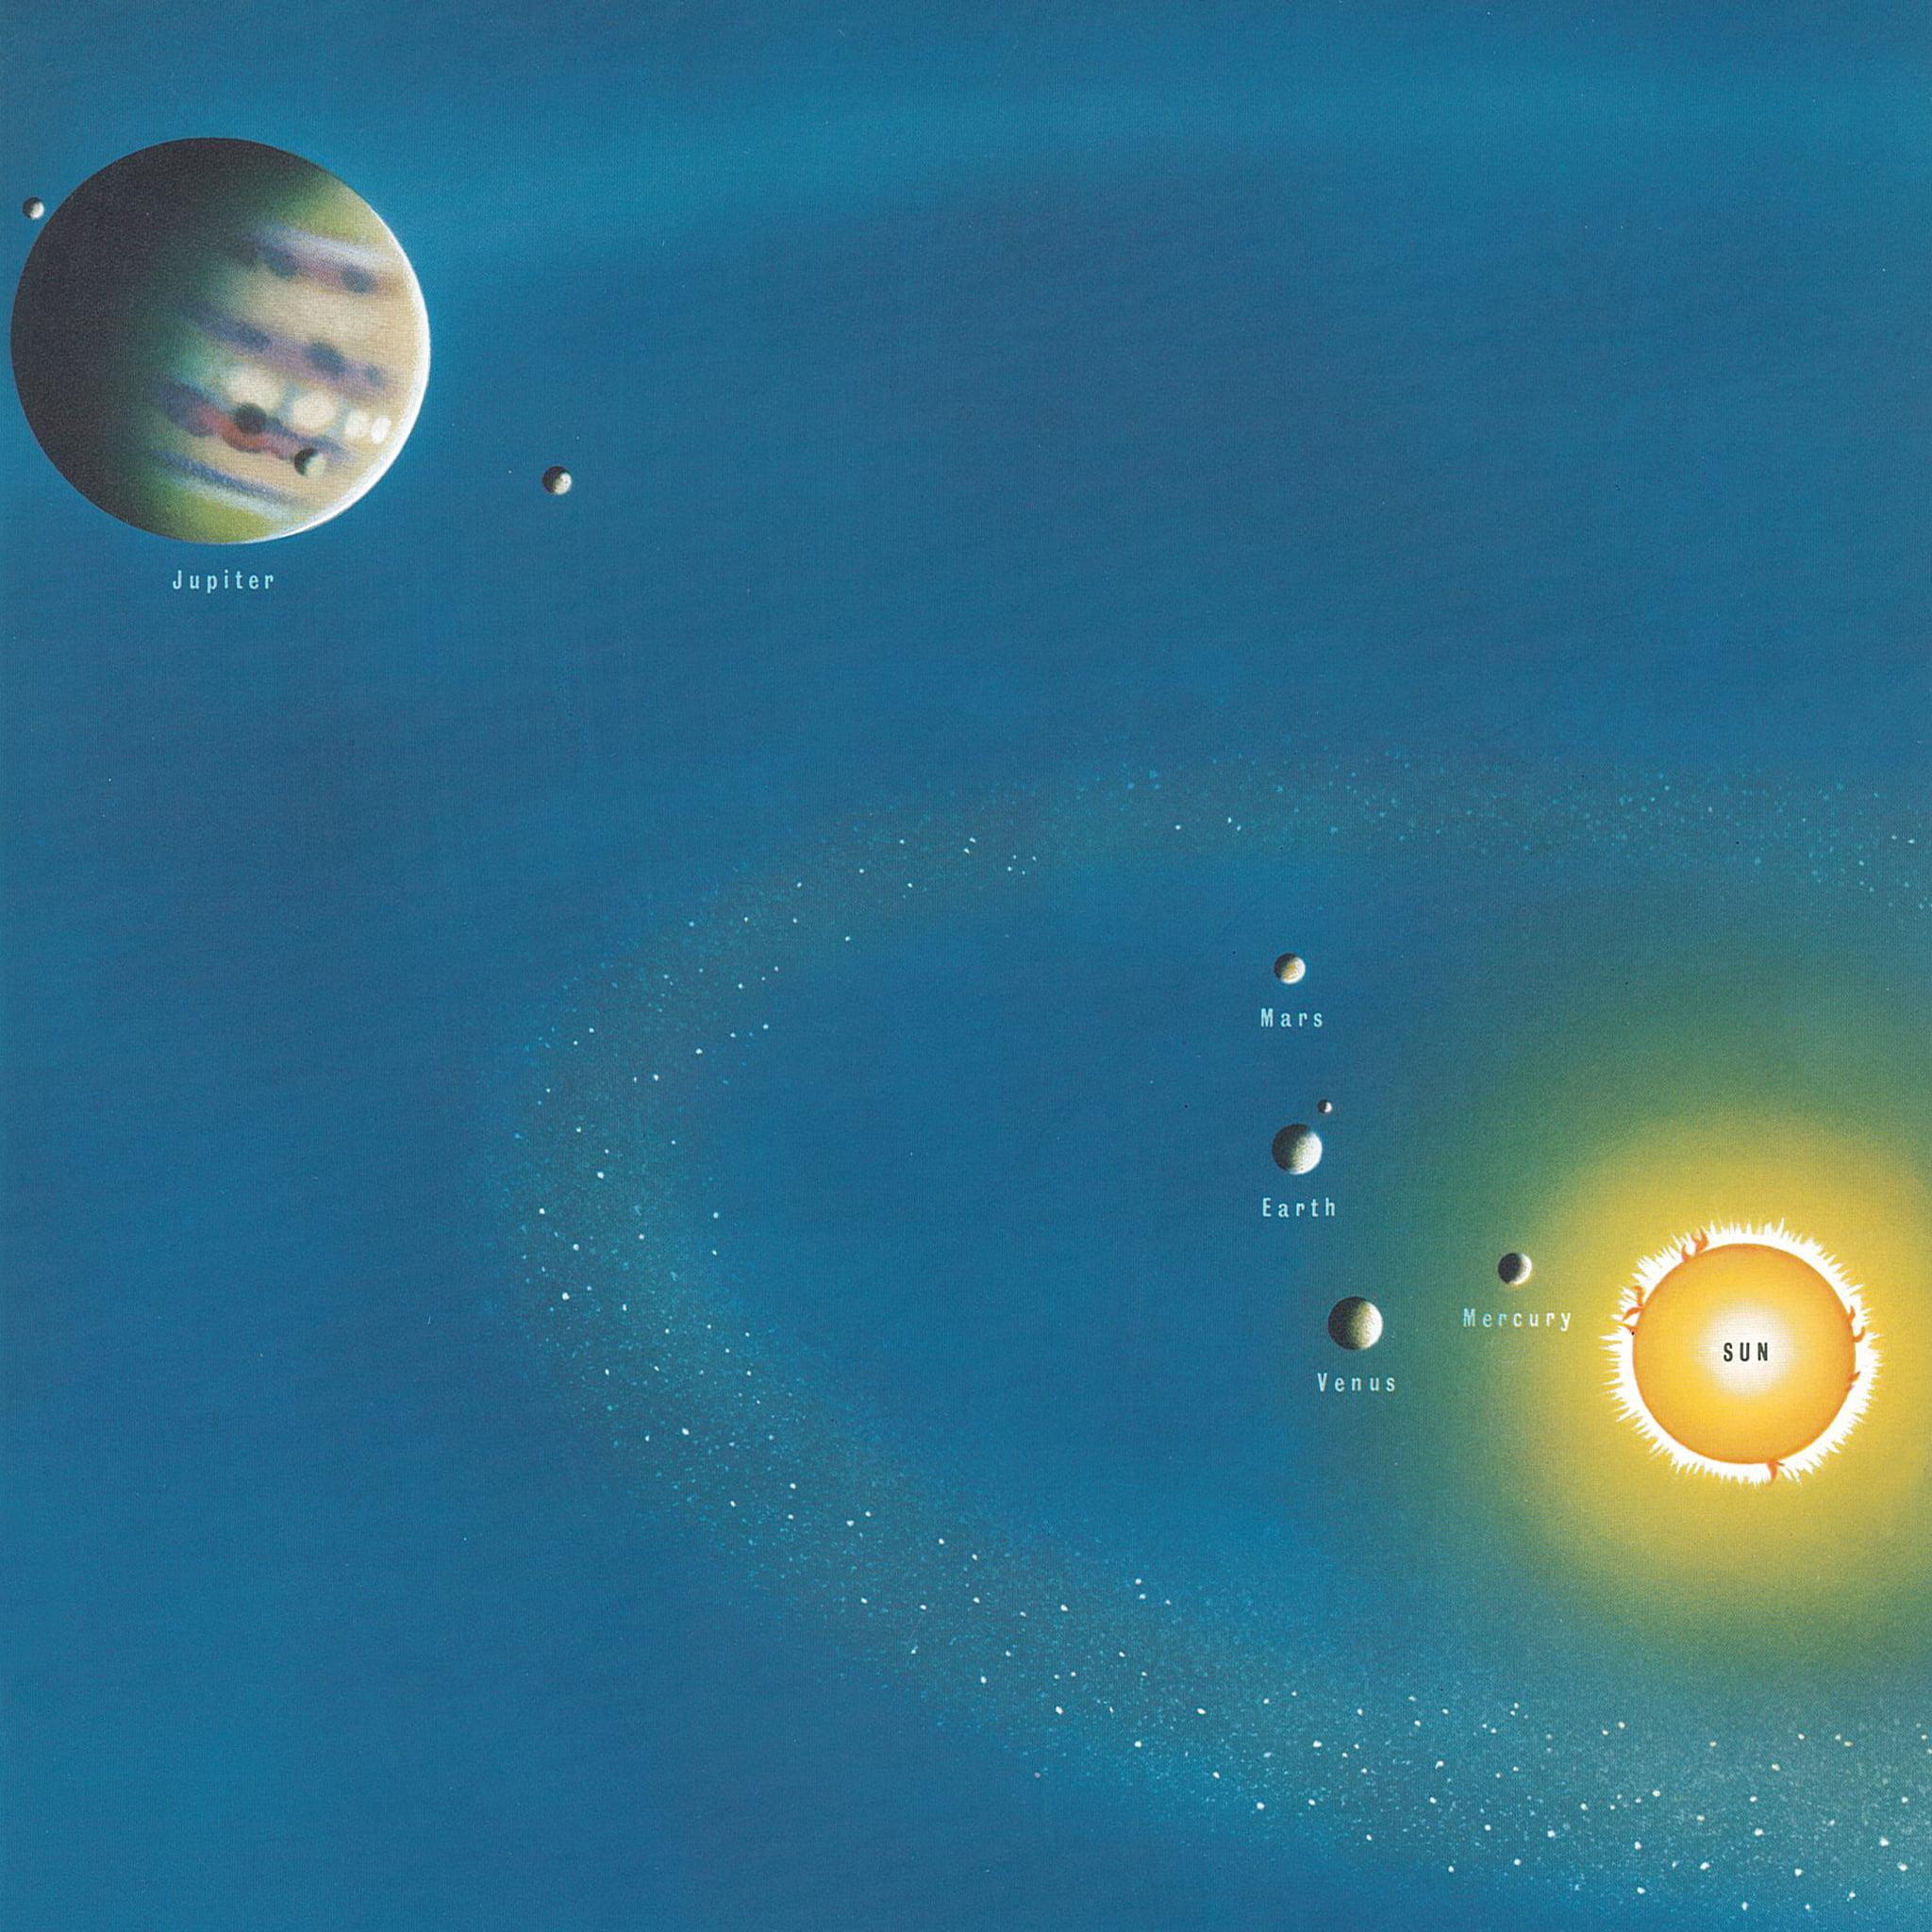 Sun-solar-system-planet-chart-vintage